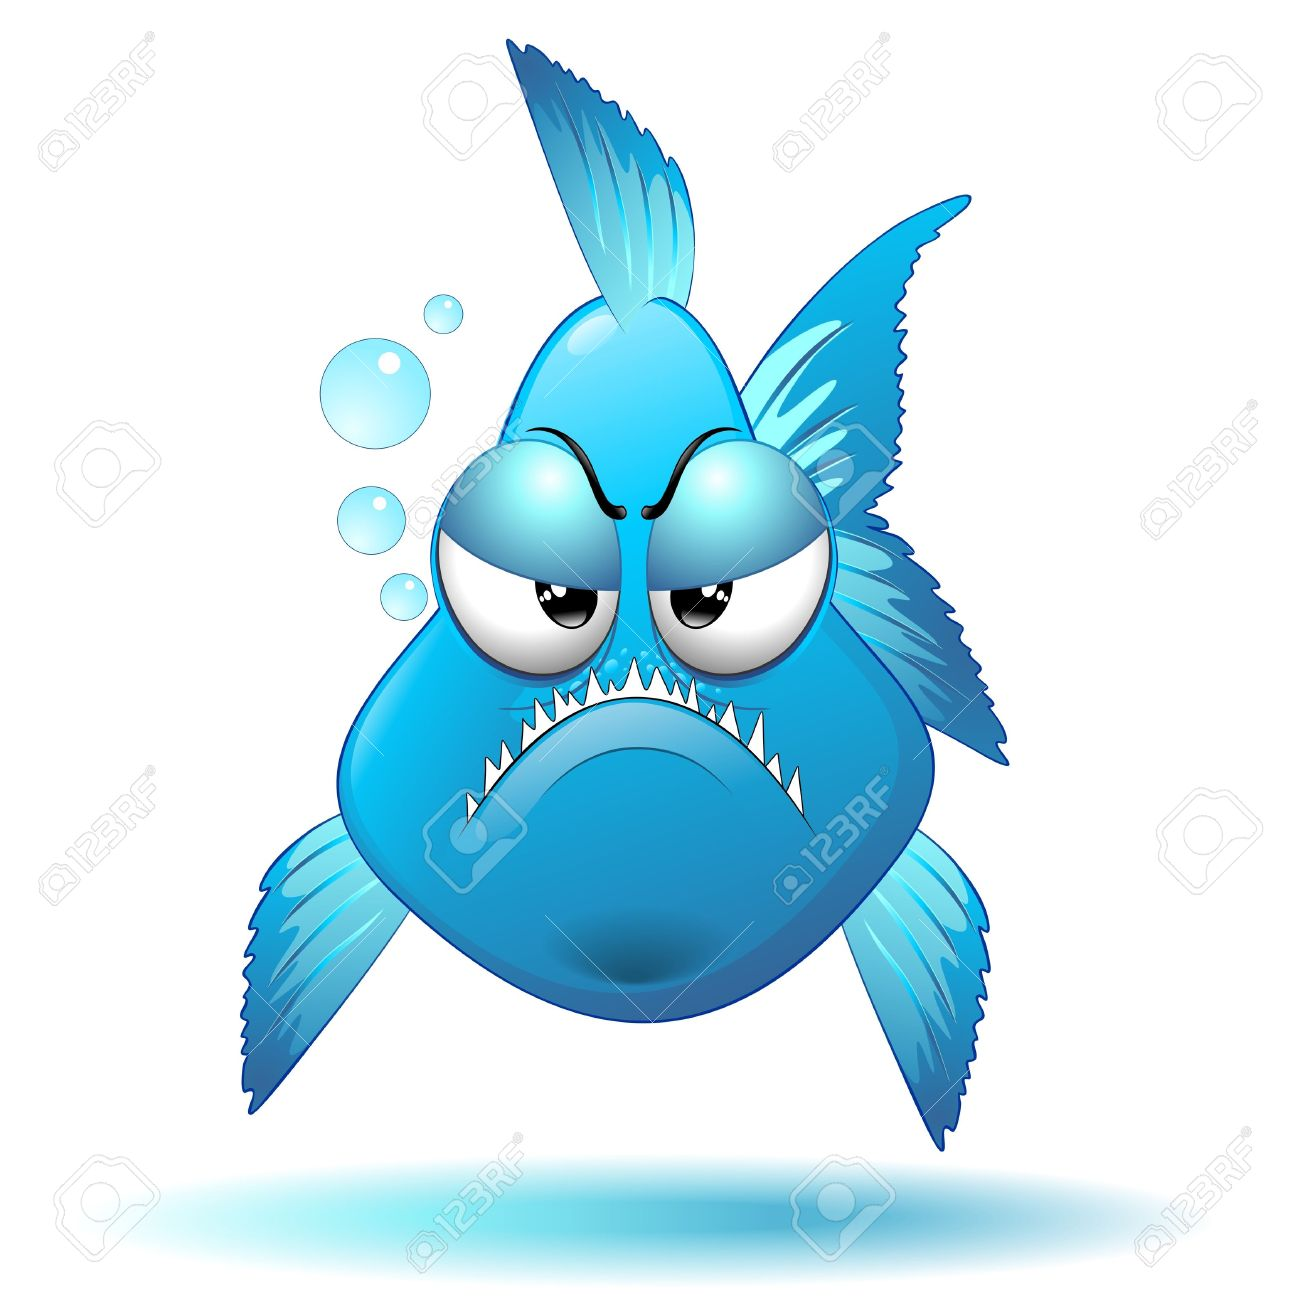 Piranha clipart animated #15